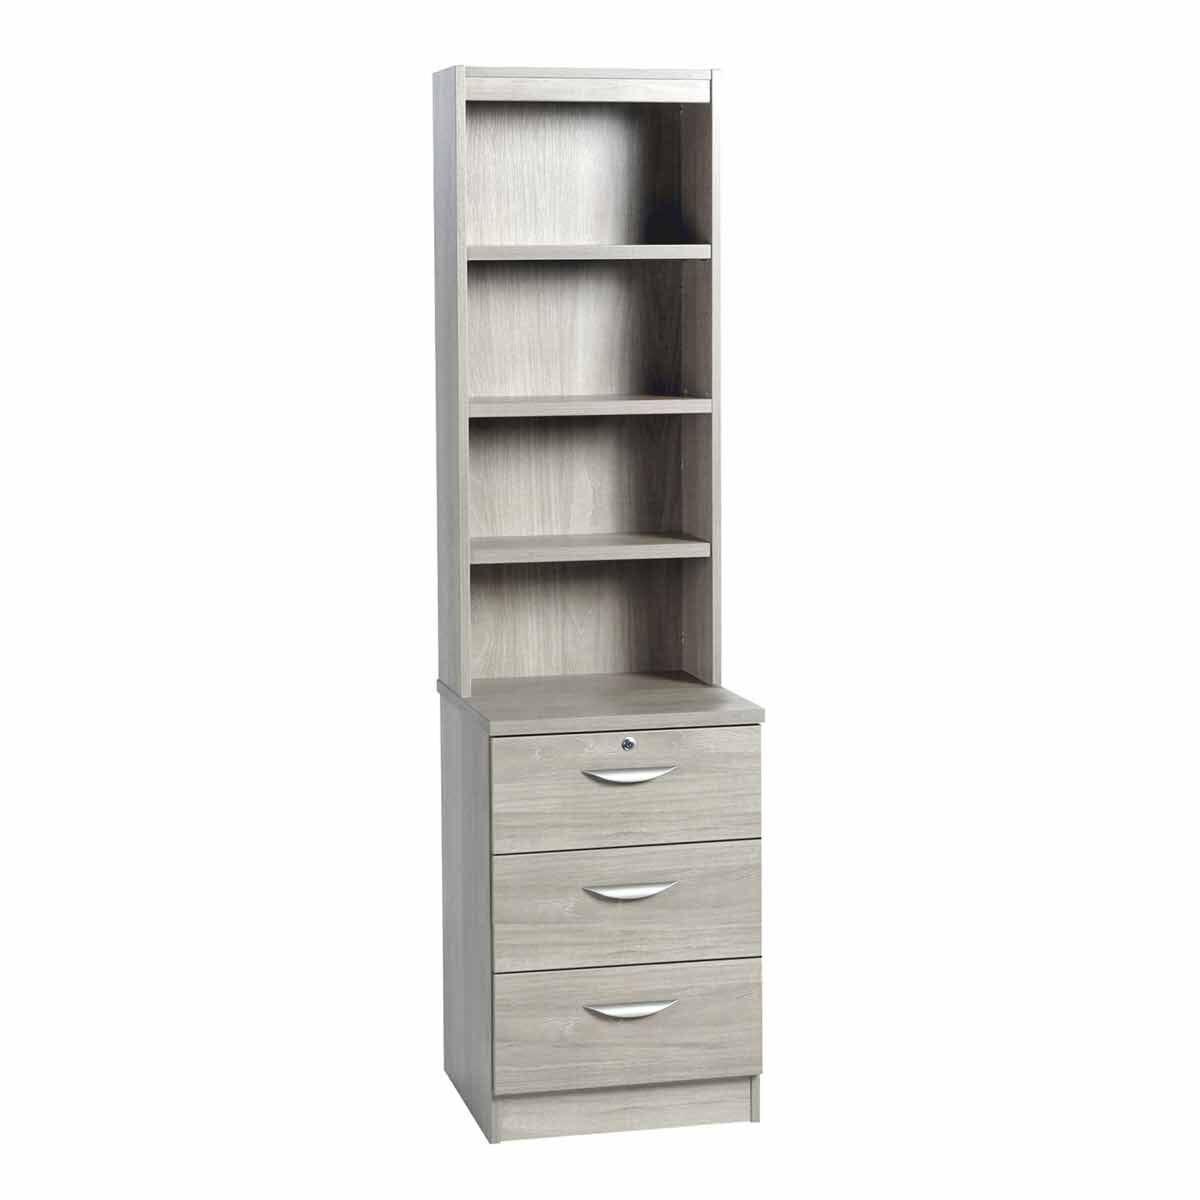 R White 3 Drawer CD/DVD Storage Unit With Overshelving Grey Nebraska